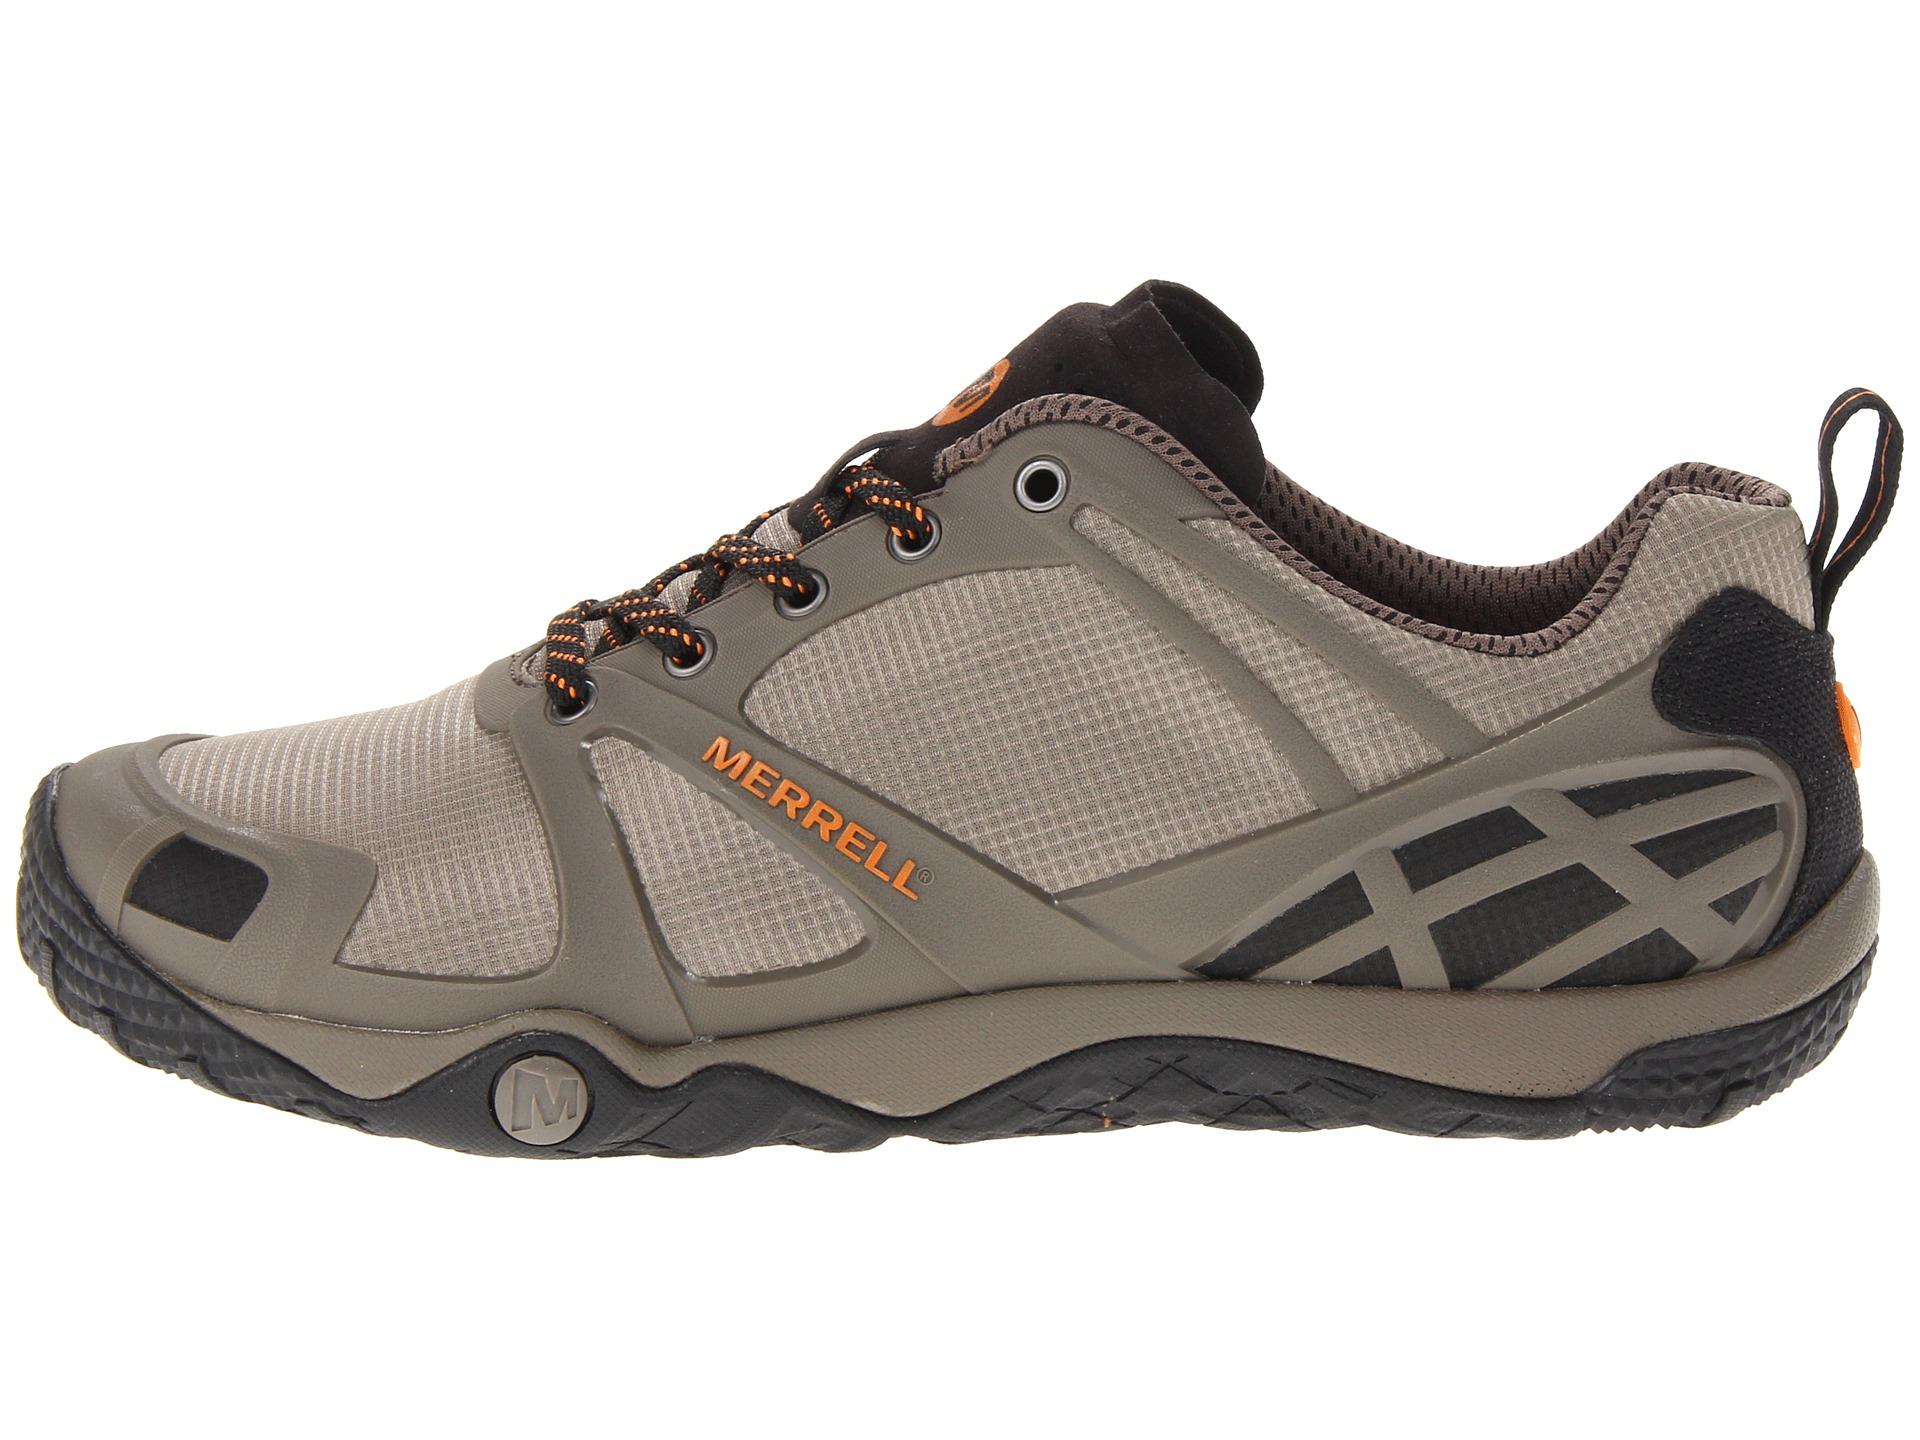 Merrell Shoes For Men Sale Images Sandals